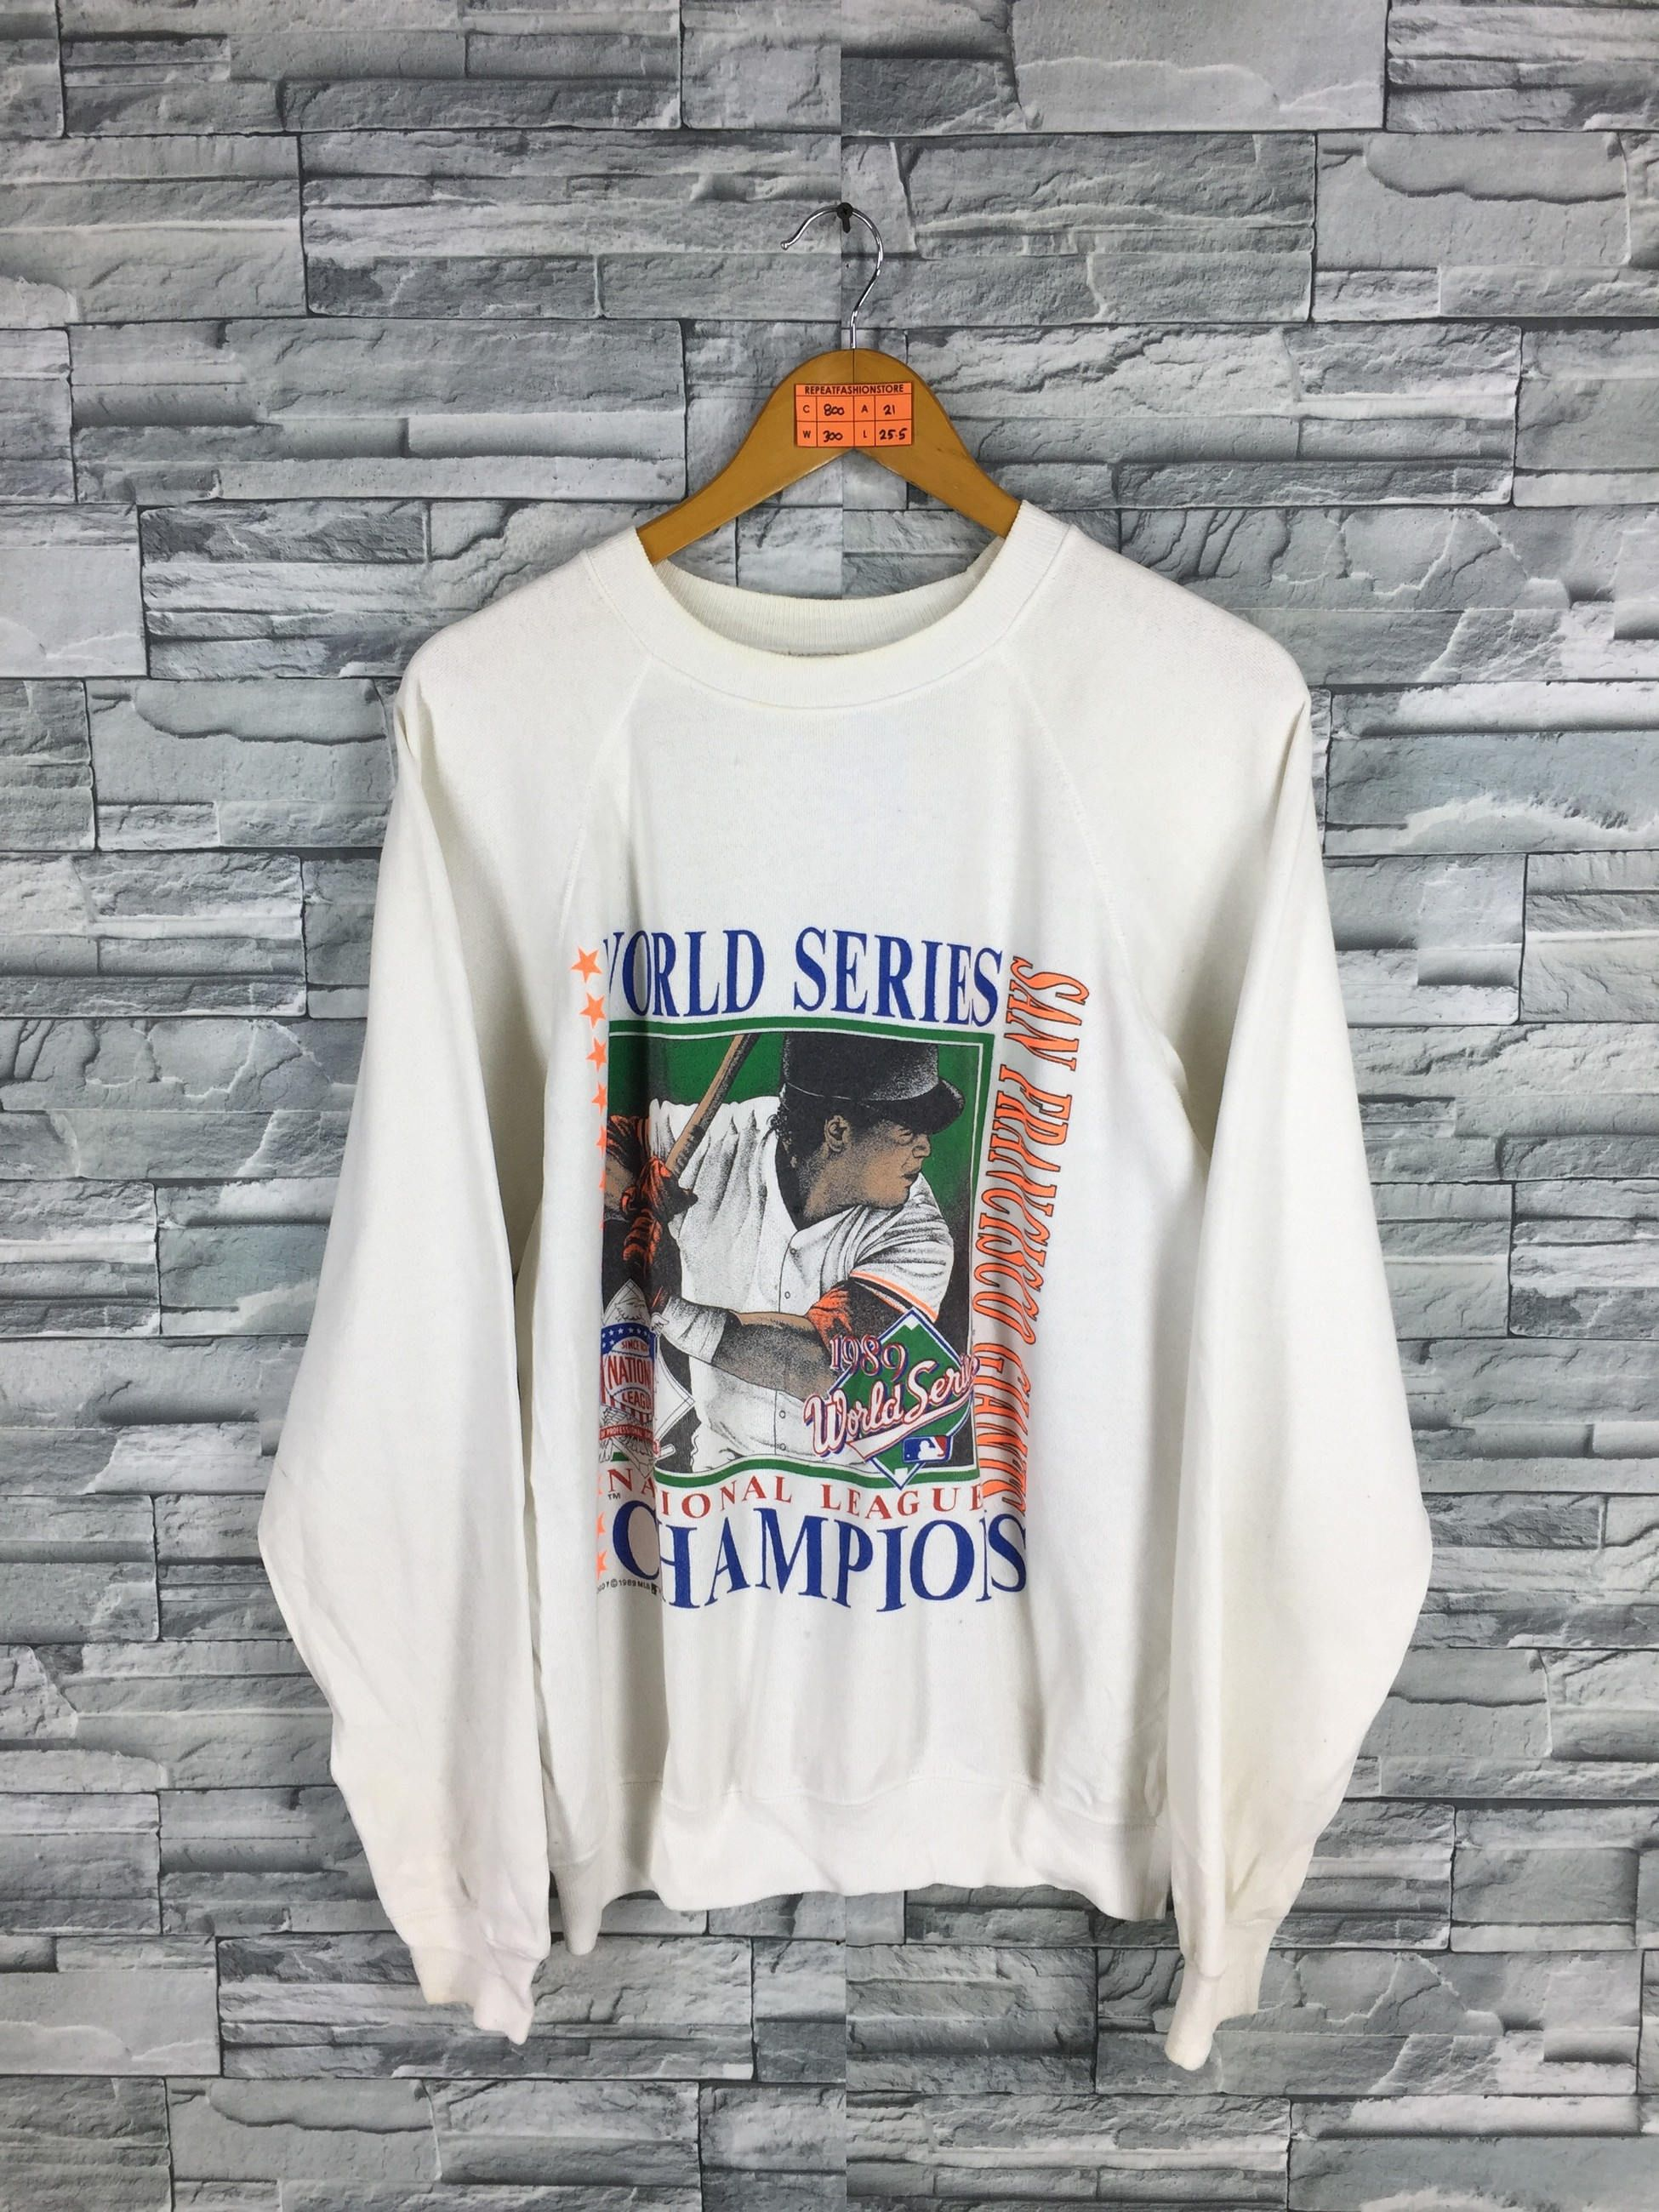 Predownload: San Francisco Giants Jumper Sweater Large Vintage 90 S World Champion Giants Baseball Team Mlb Baseball Whit Pullover Sweatshirts Sweatshirts Unique Sweatshirt [ 2600 x 1950 Pixel ]